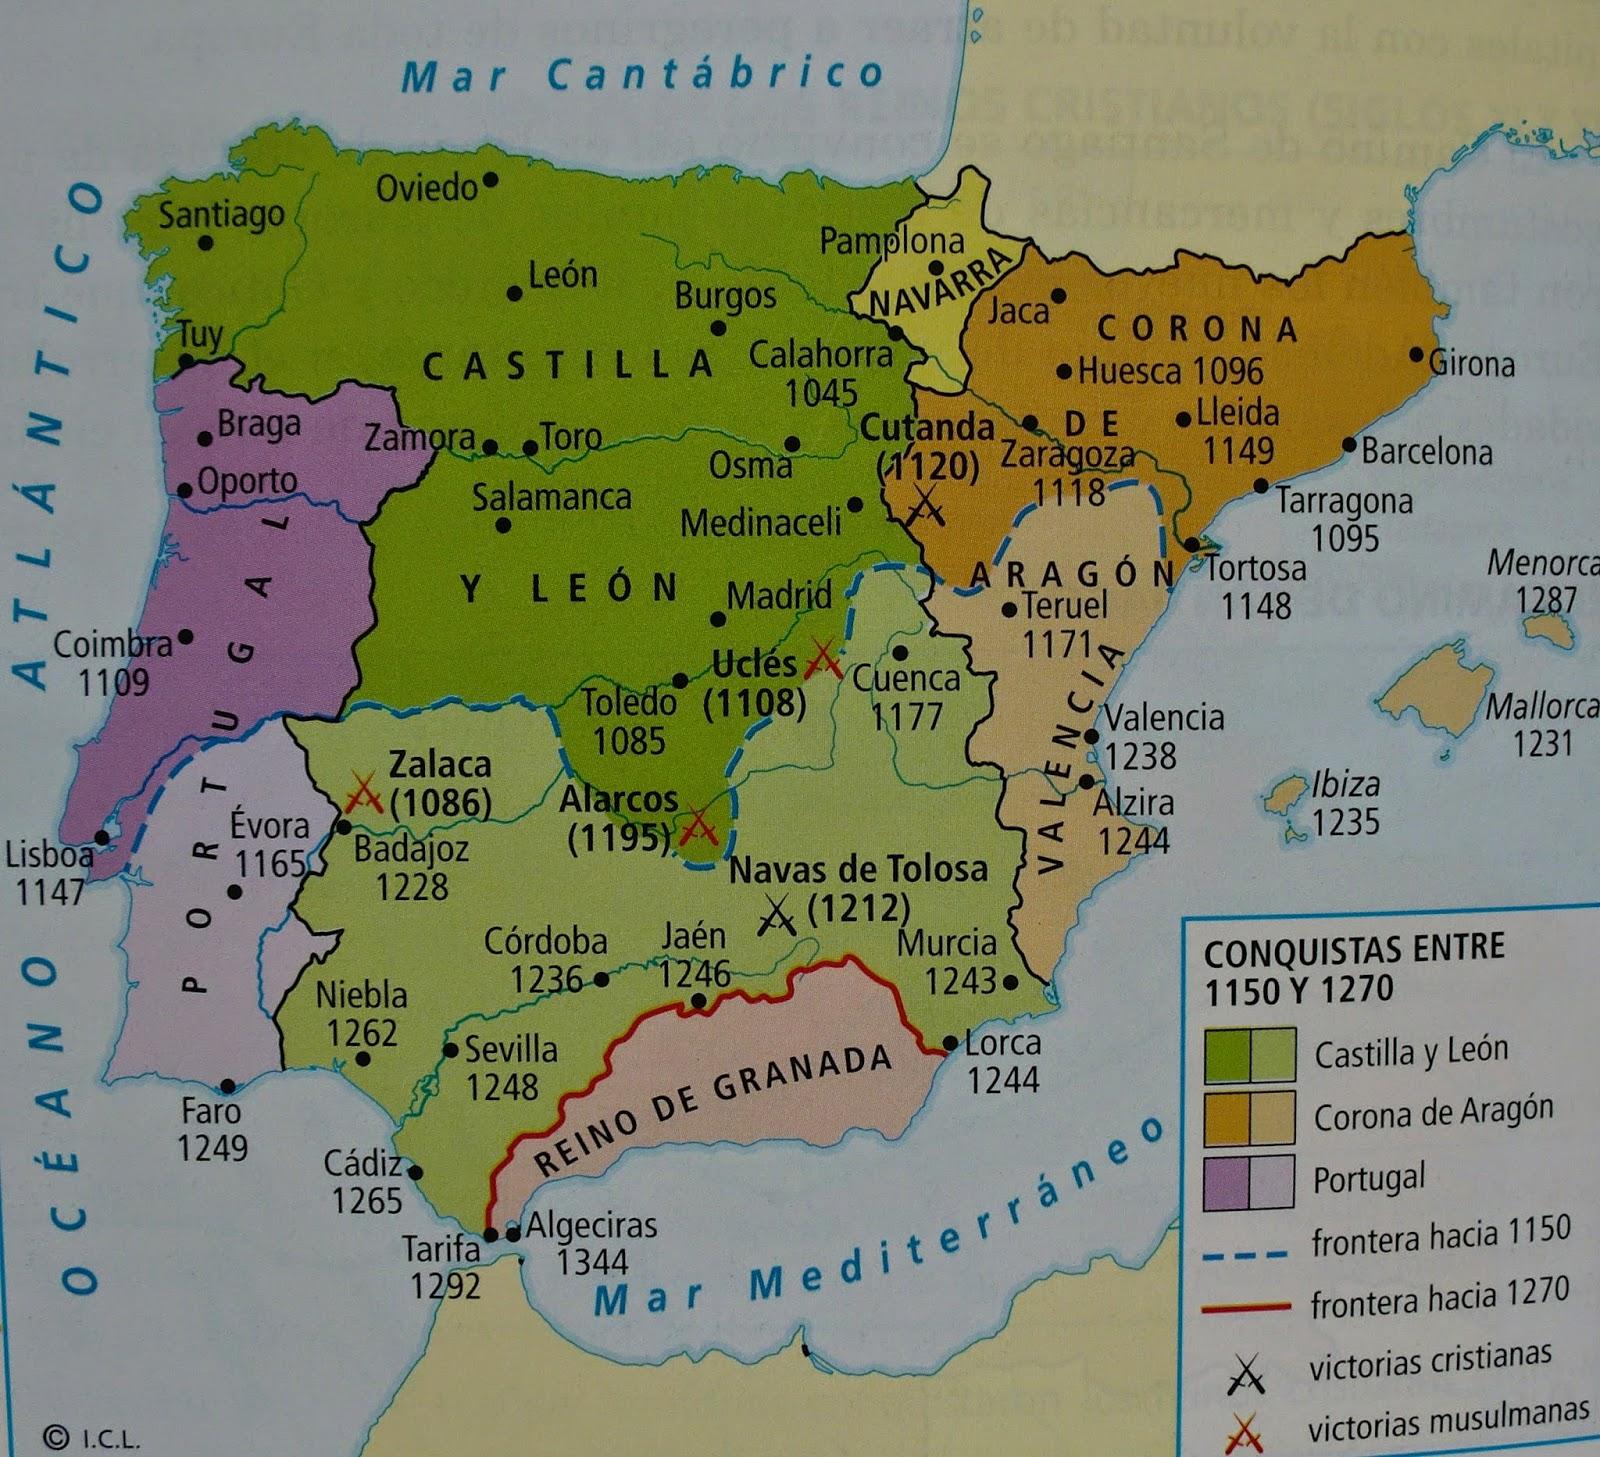 COMENTARIO DE MAPAS  Ensear y aprender Geografa e Historia